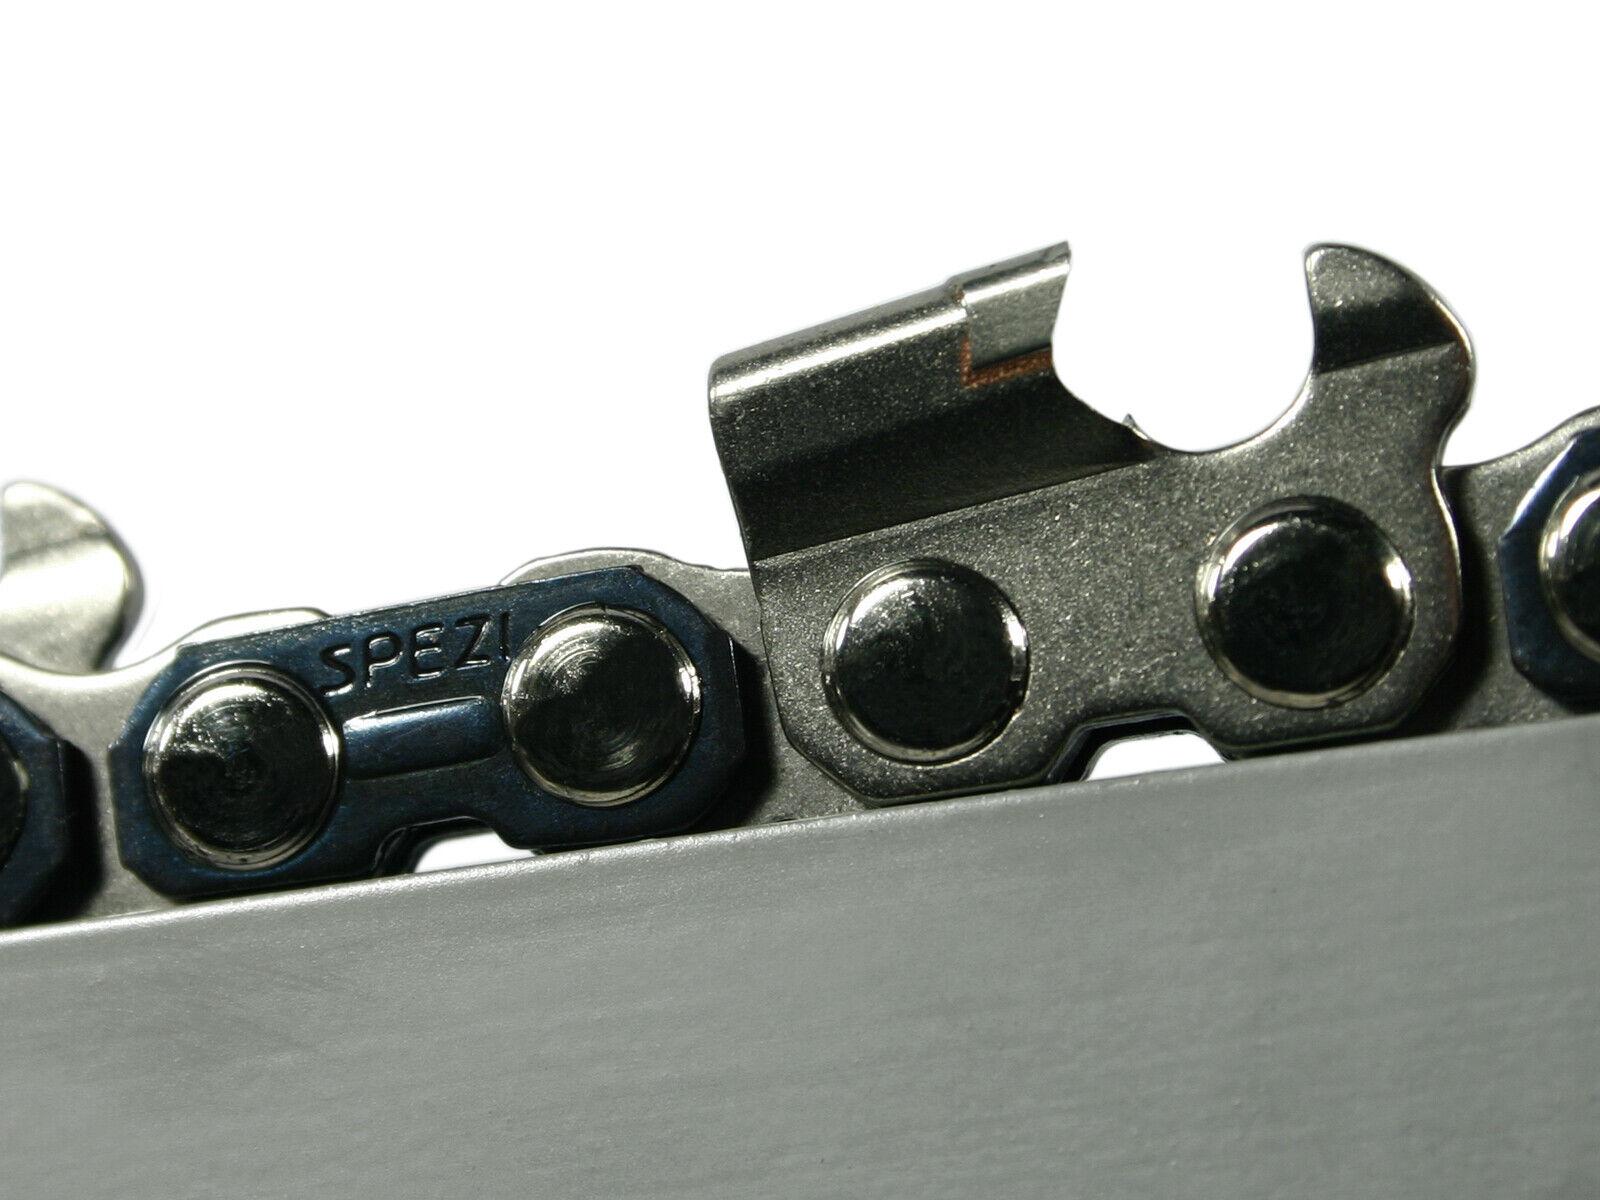 Metal duro cadena sierra adecuado para Husqvarna 234 43 cm 3 8  64 TG 1,5 mm Cochebide